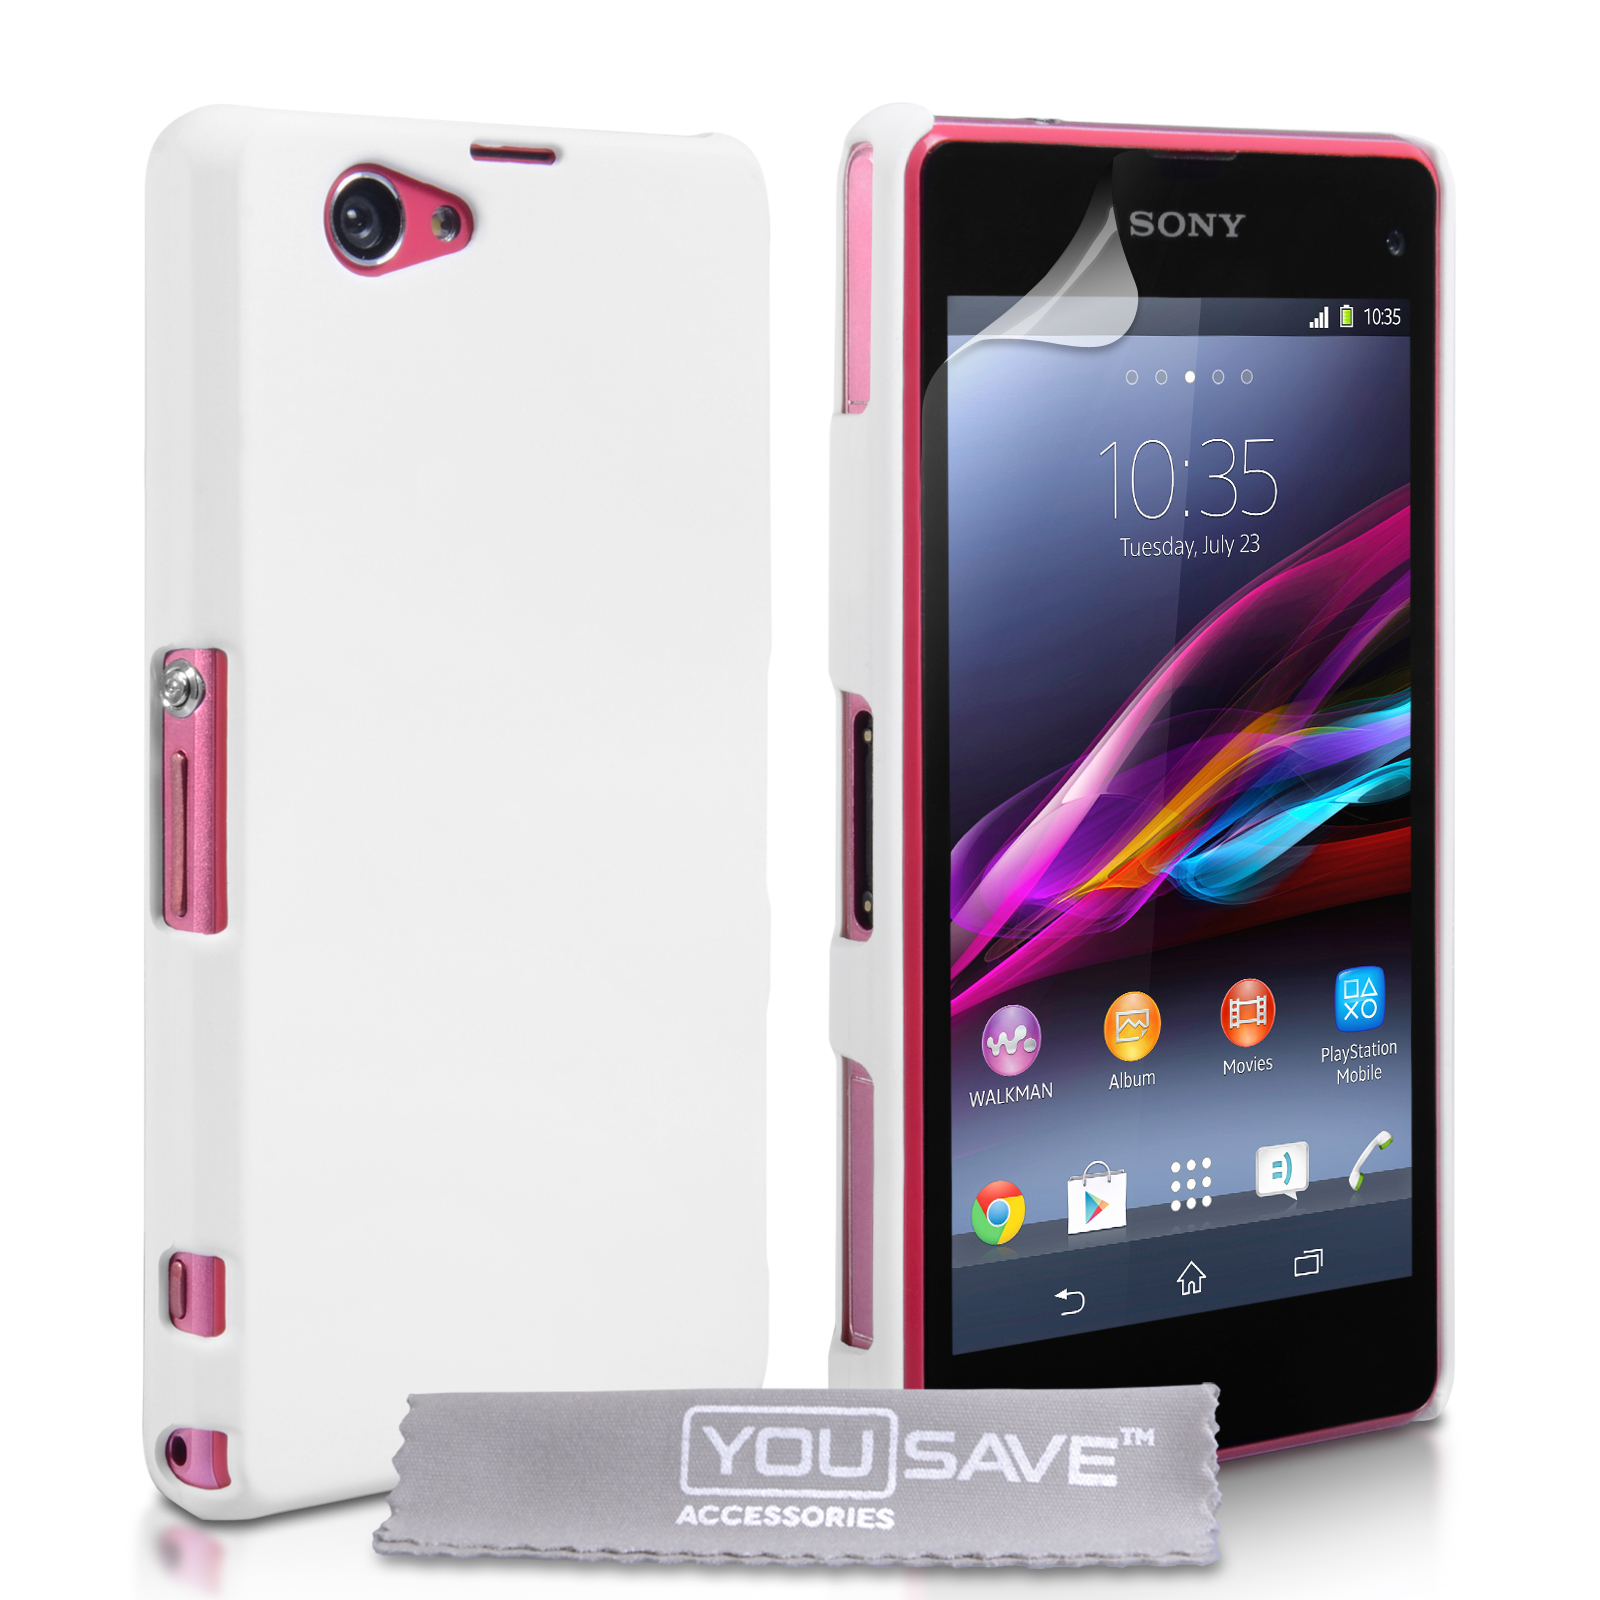 YouSave Πλαστική Θήκη Sony Xperia Z1 Compact  - Λευκό (Z934)